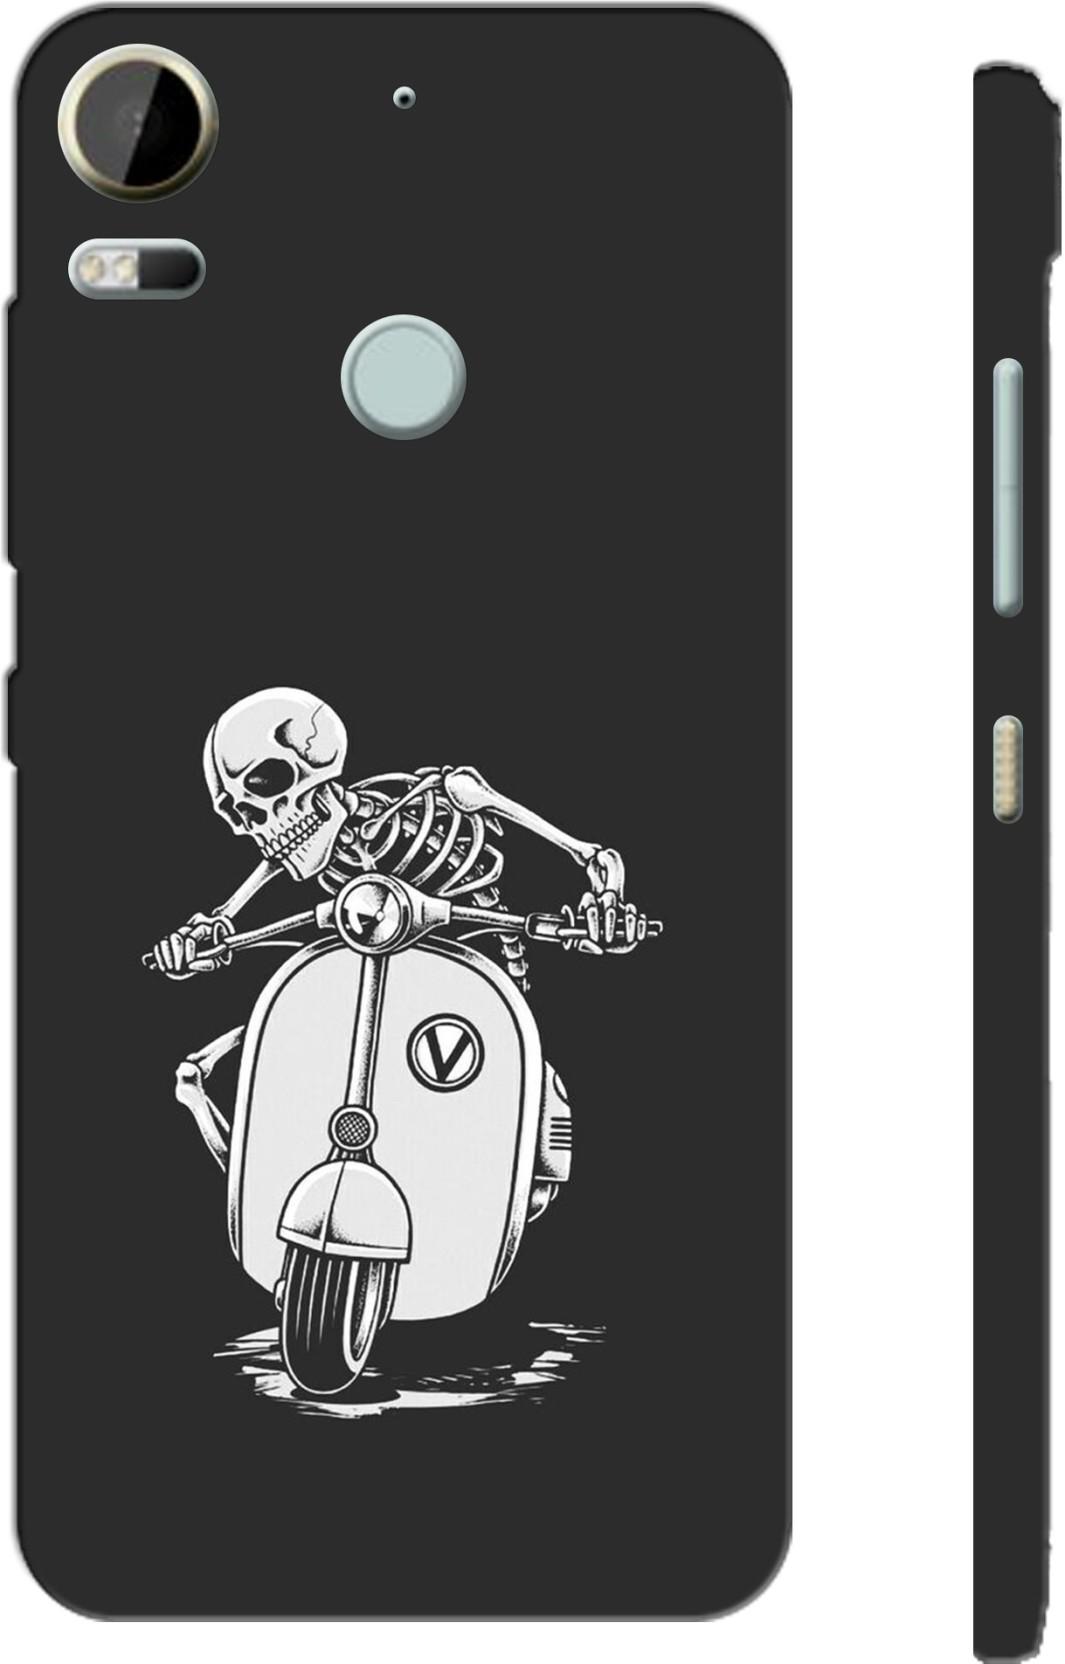 the latest 7eb71 b2e58 Picwik Back Cover for HTC Desire 10 Pro - Picwik : Flipkart.com